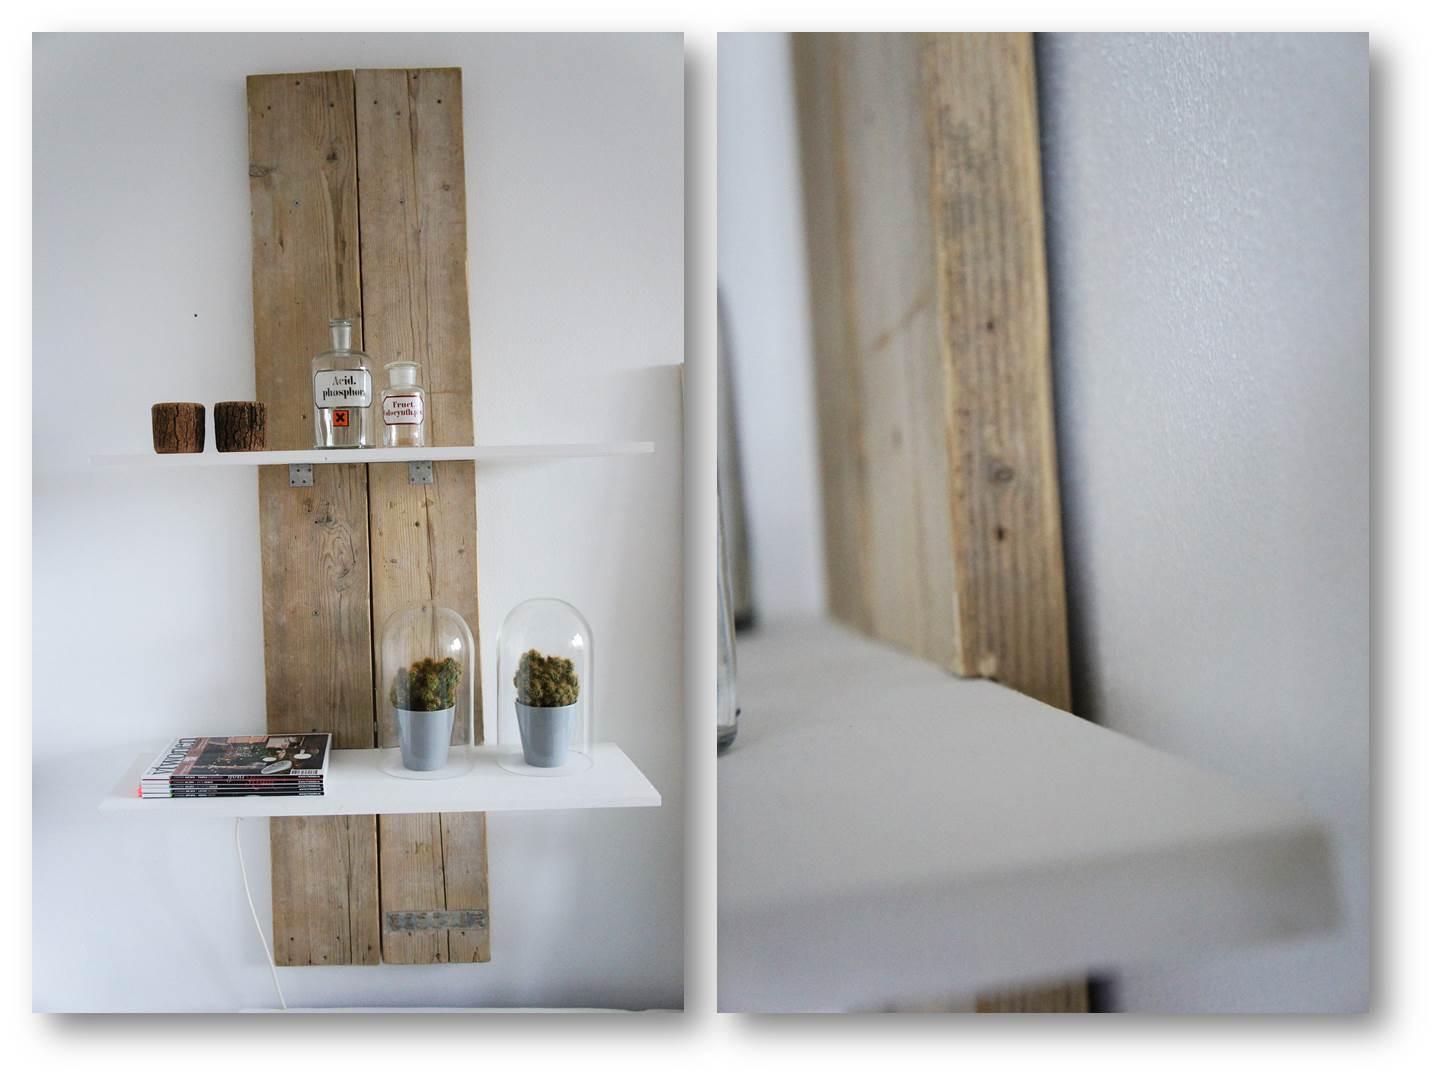 Steigerhout Muur Slaapkamer : Ik en mijn Thuis - Blog: oktober 2013